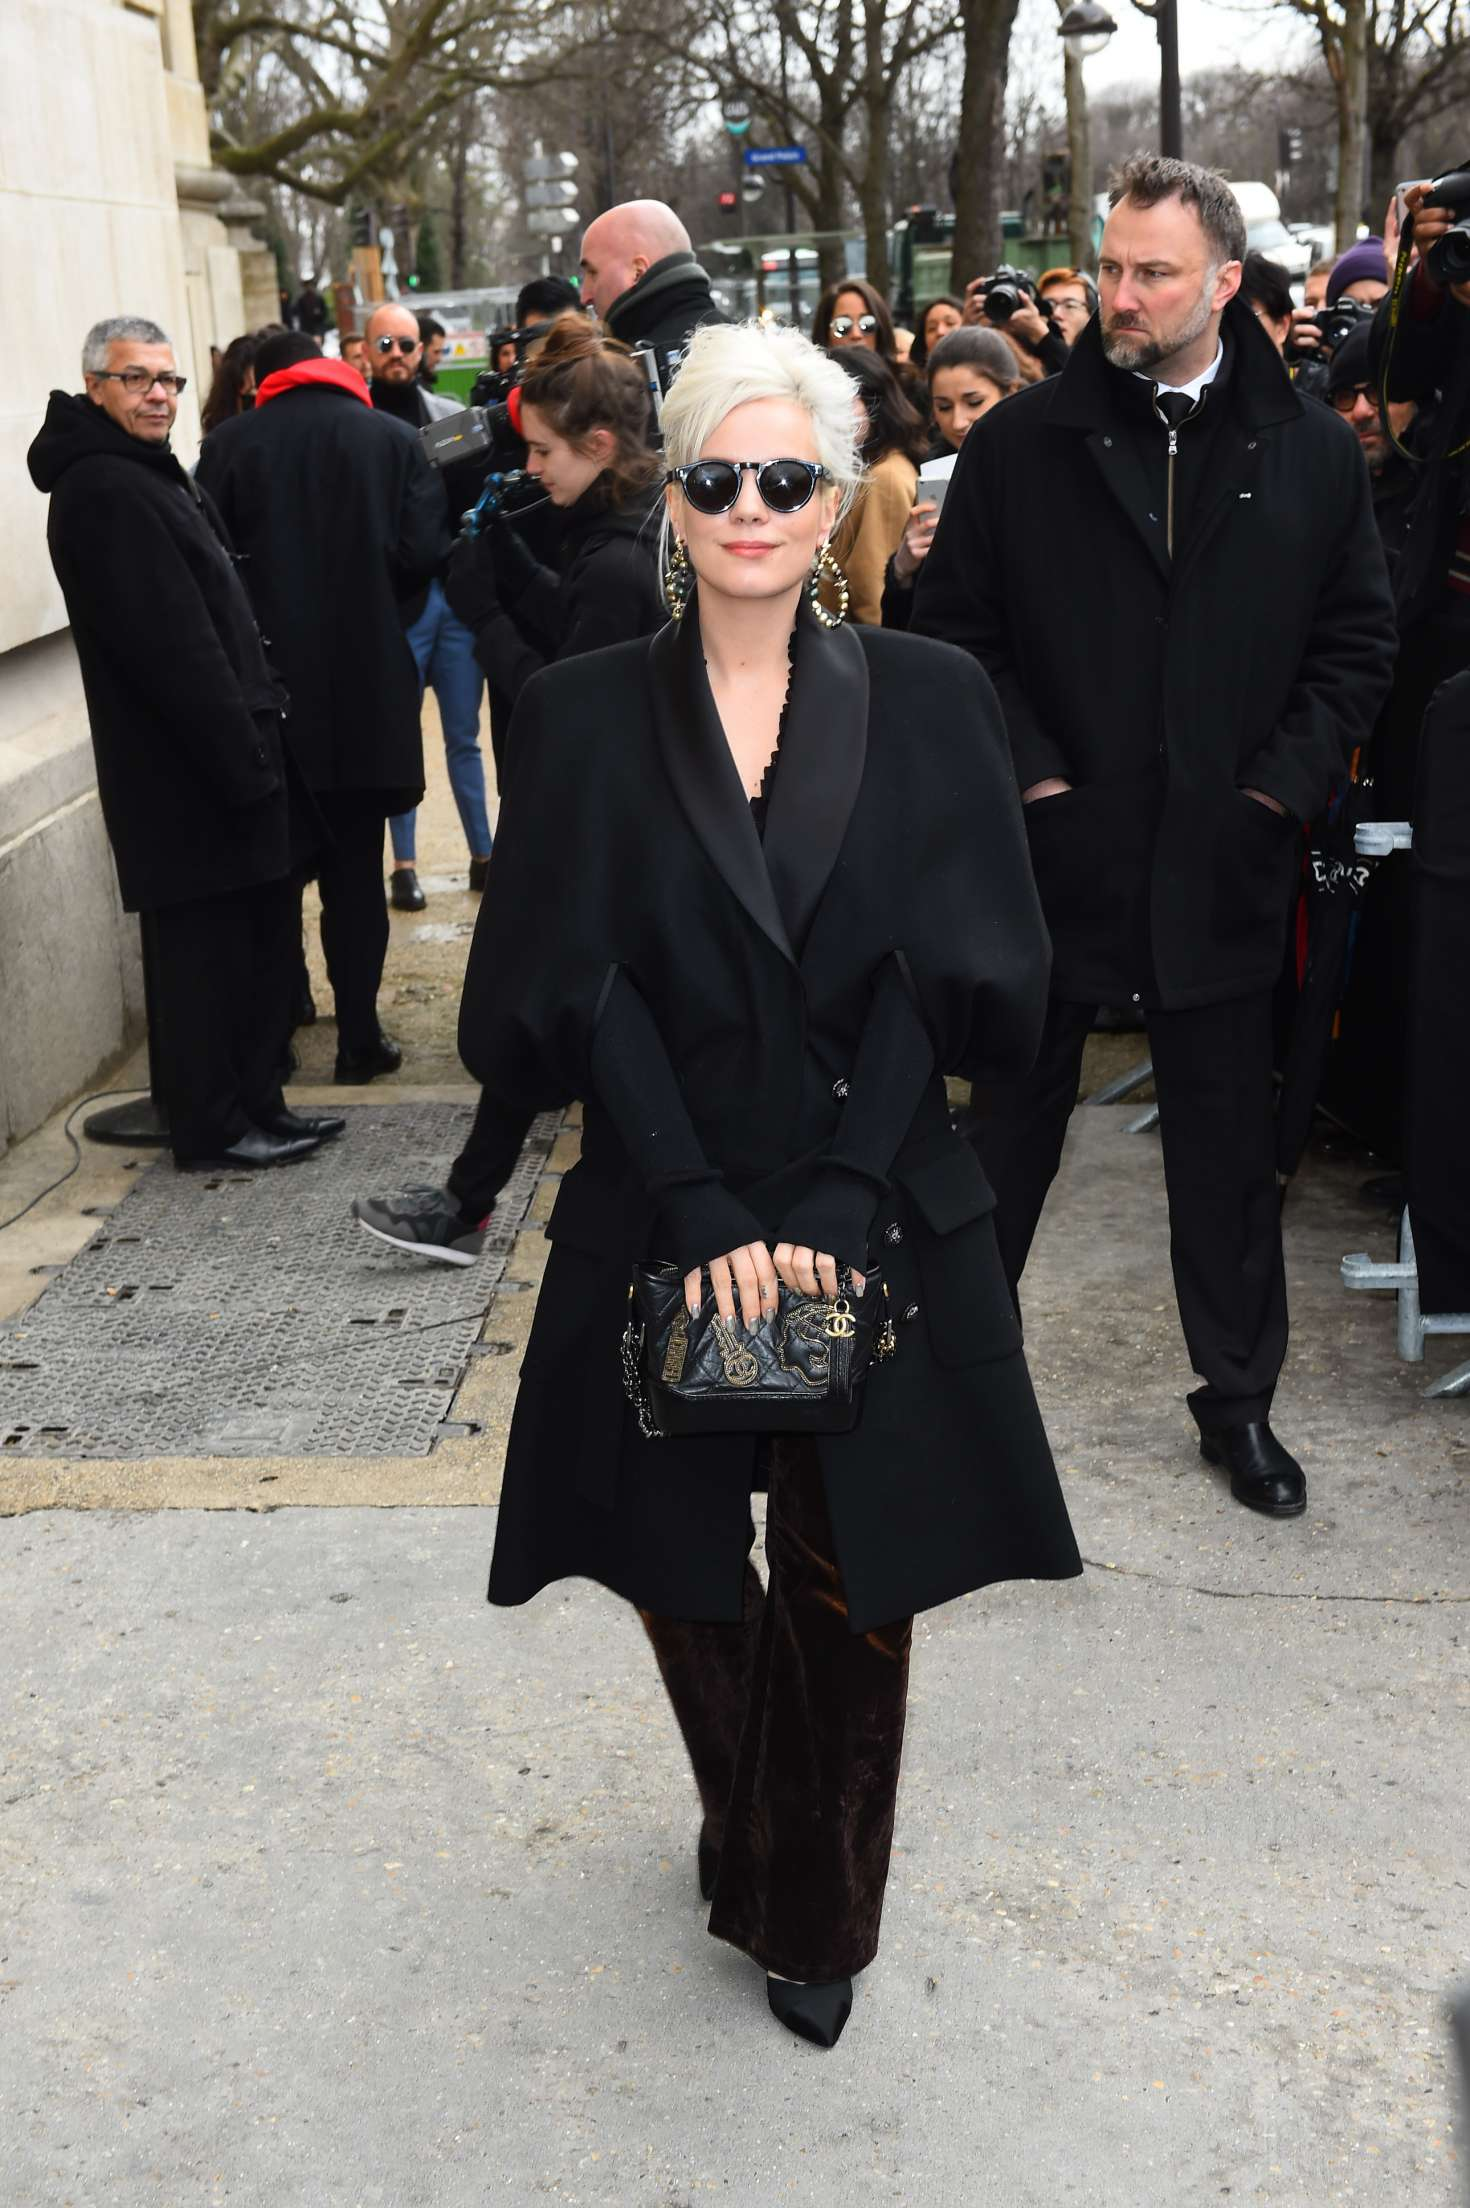 Lily Allen 2017 : Lily Allen at Chanel Show 2017 in Paris -08